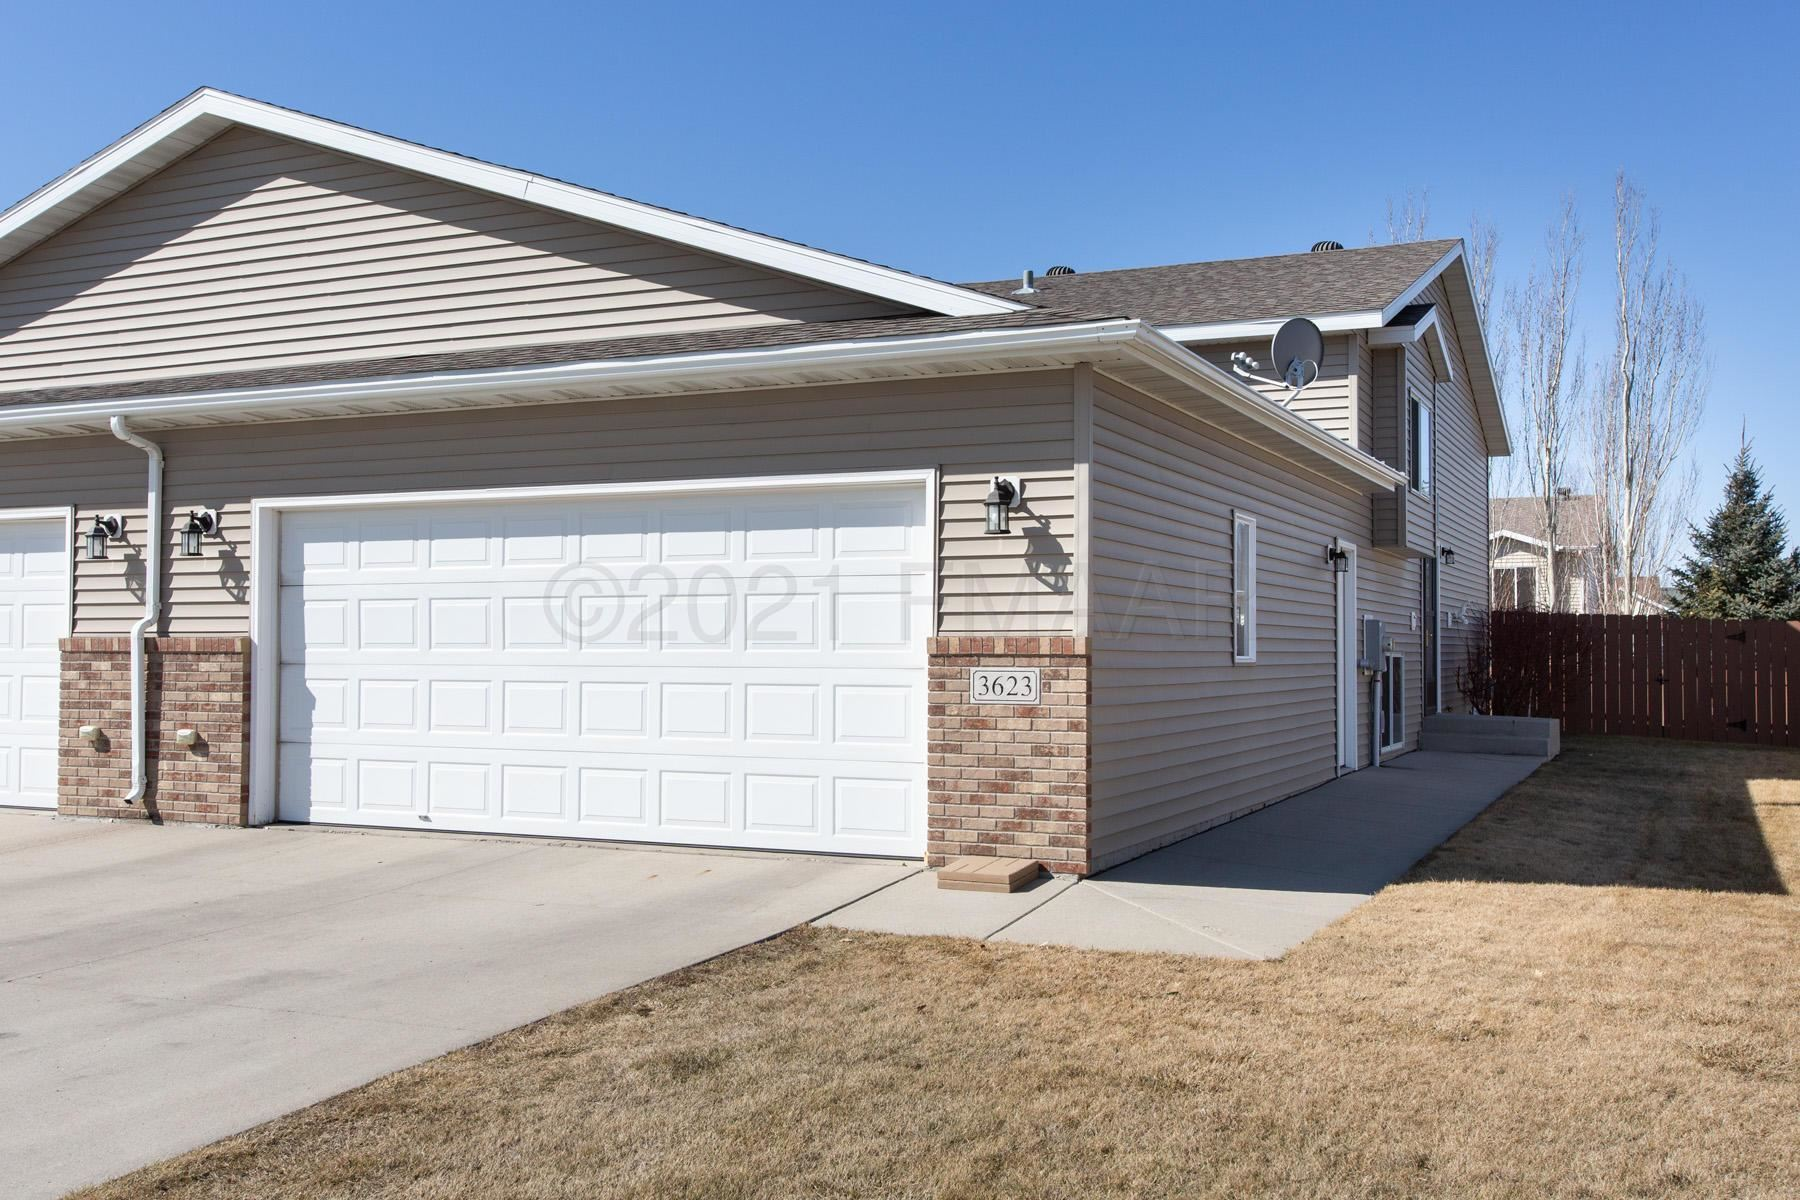 3623 POLK Street S, Fargo, ND 58104 - #: 21-1444